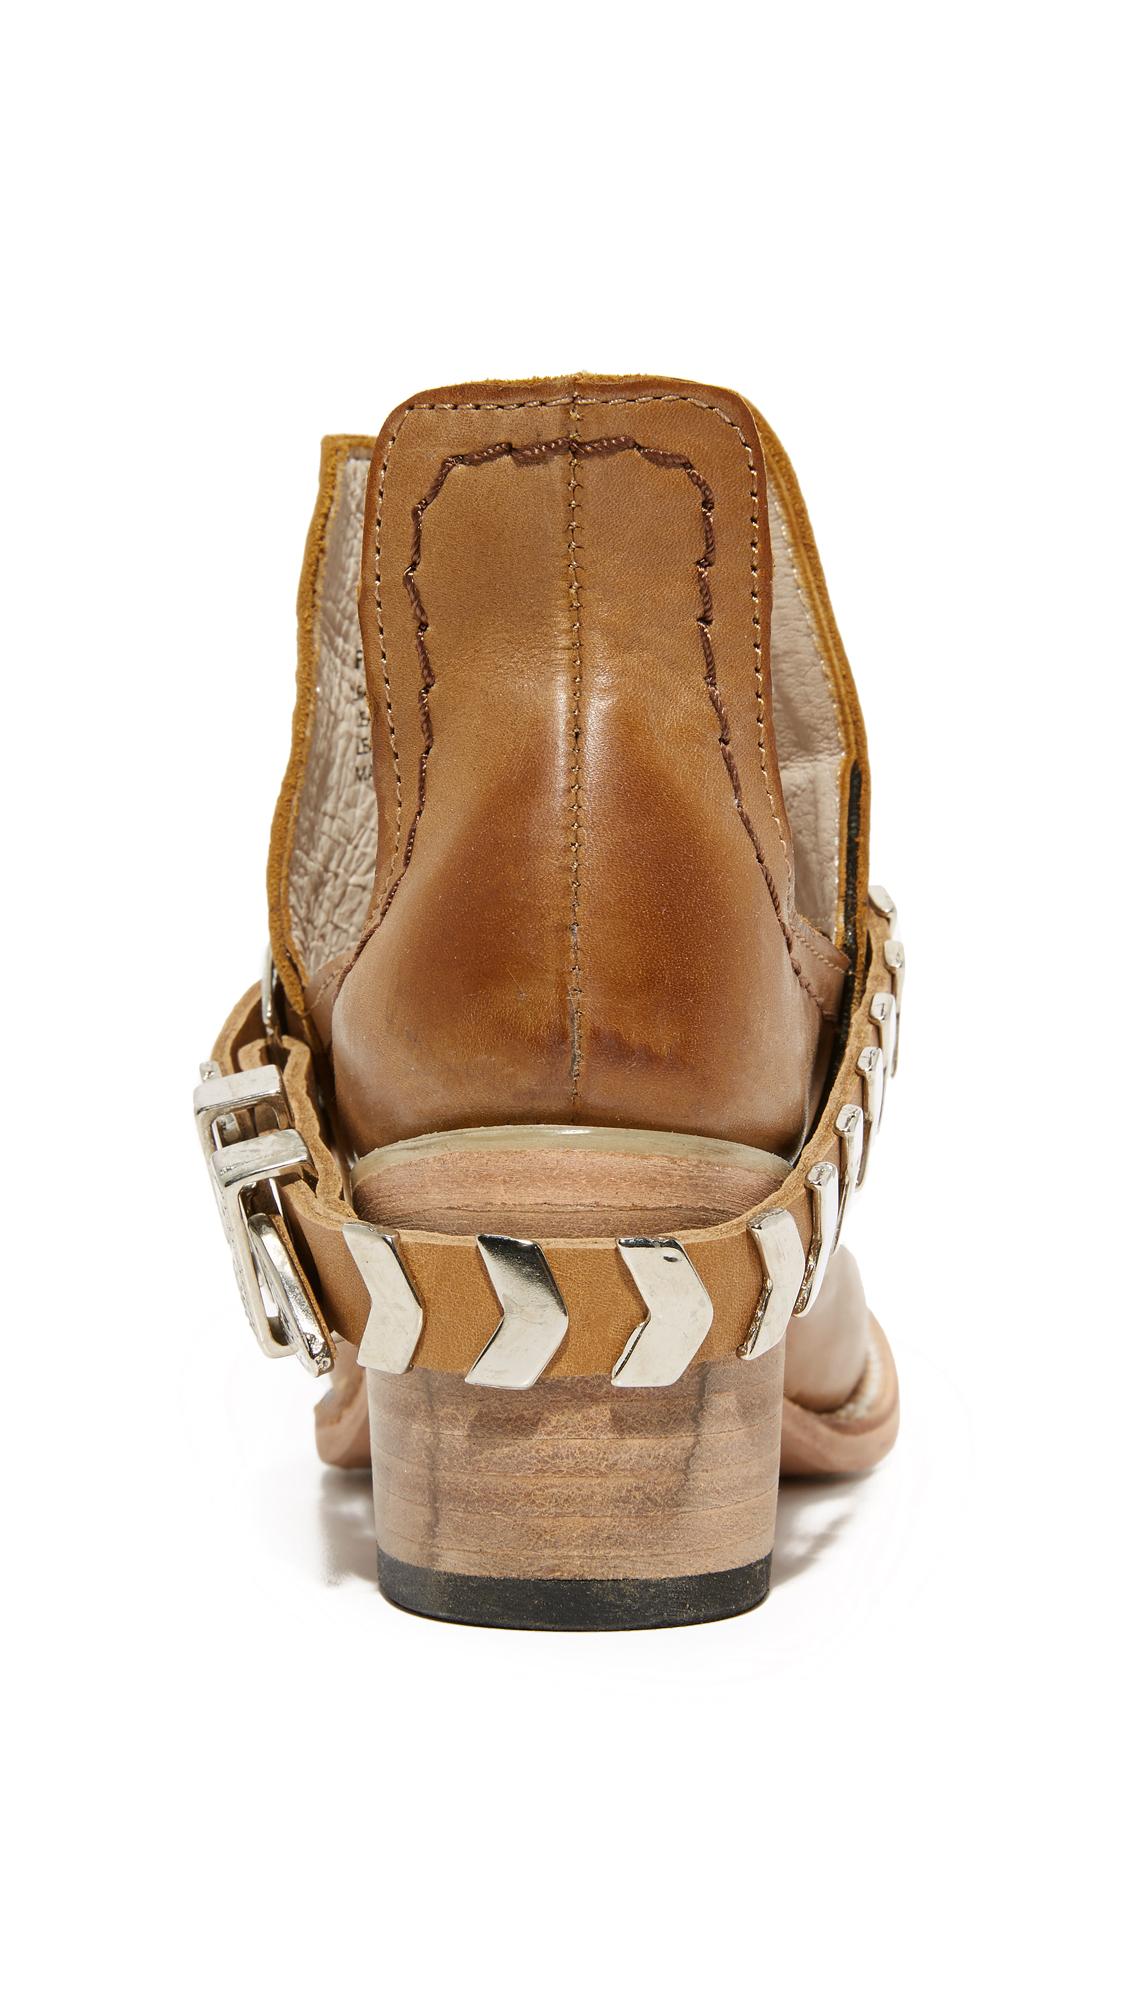 Freebird By Steven Blade Cutout Booties Shopbop D Island Shoes Boots Chukka Slip On Dark Brown Leather